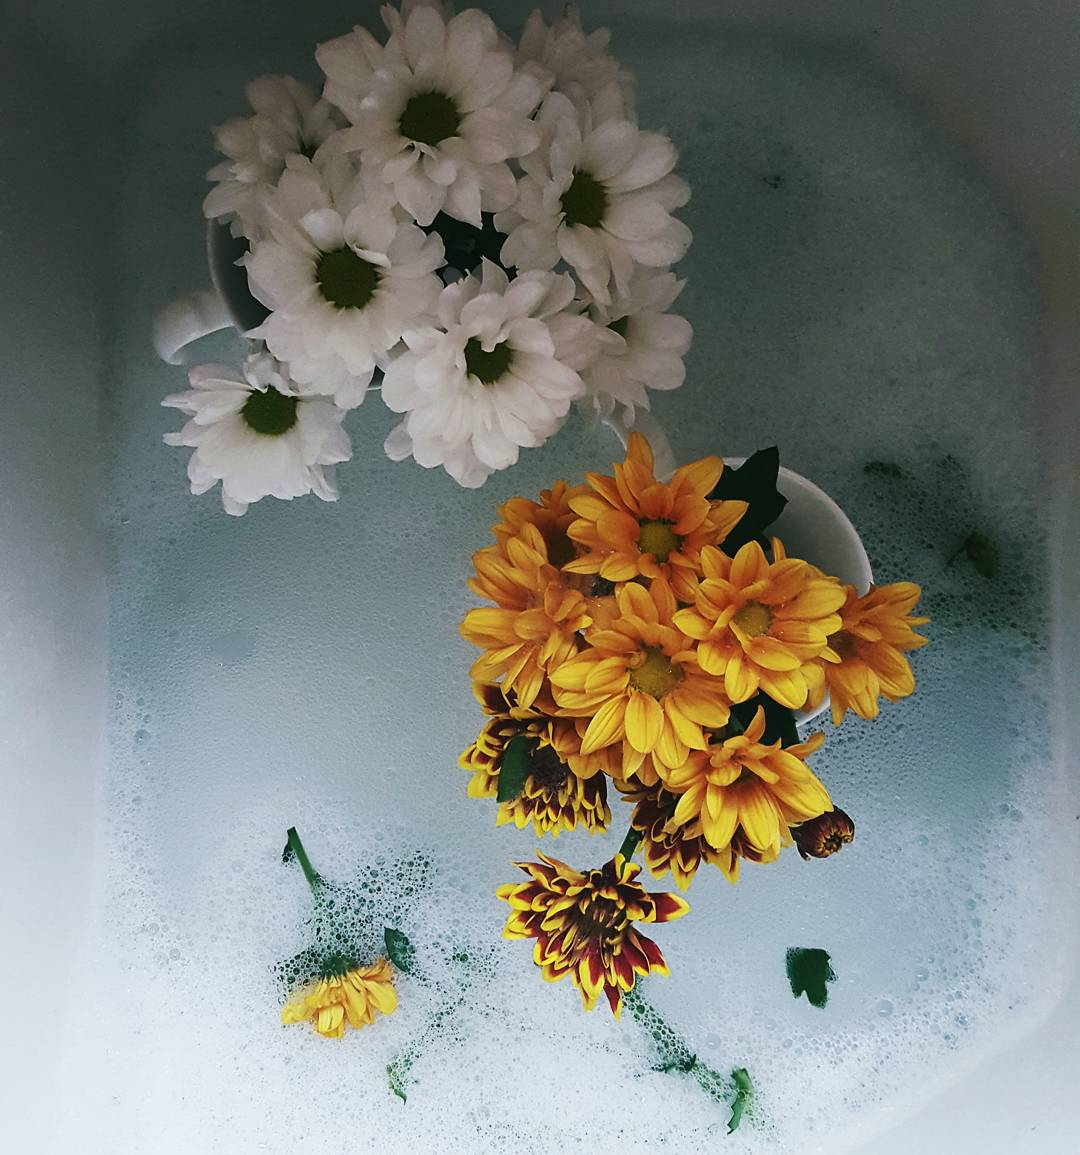 creative writing flowers bloom and grow